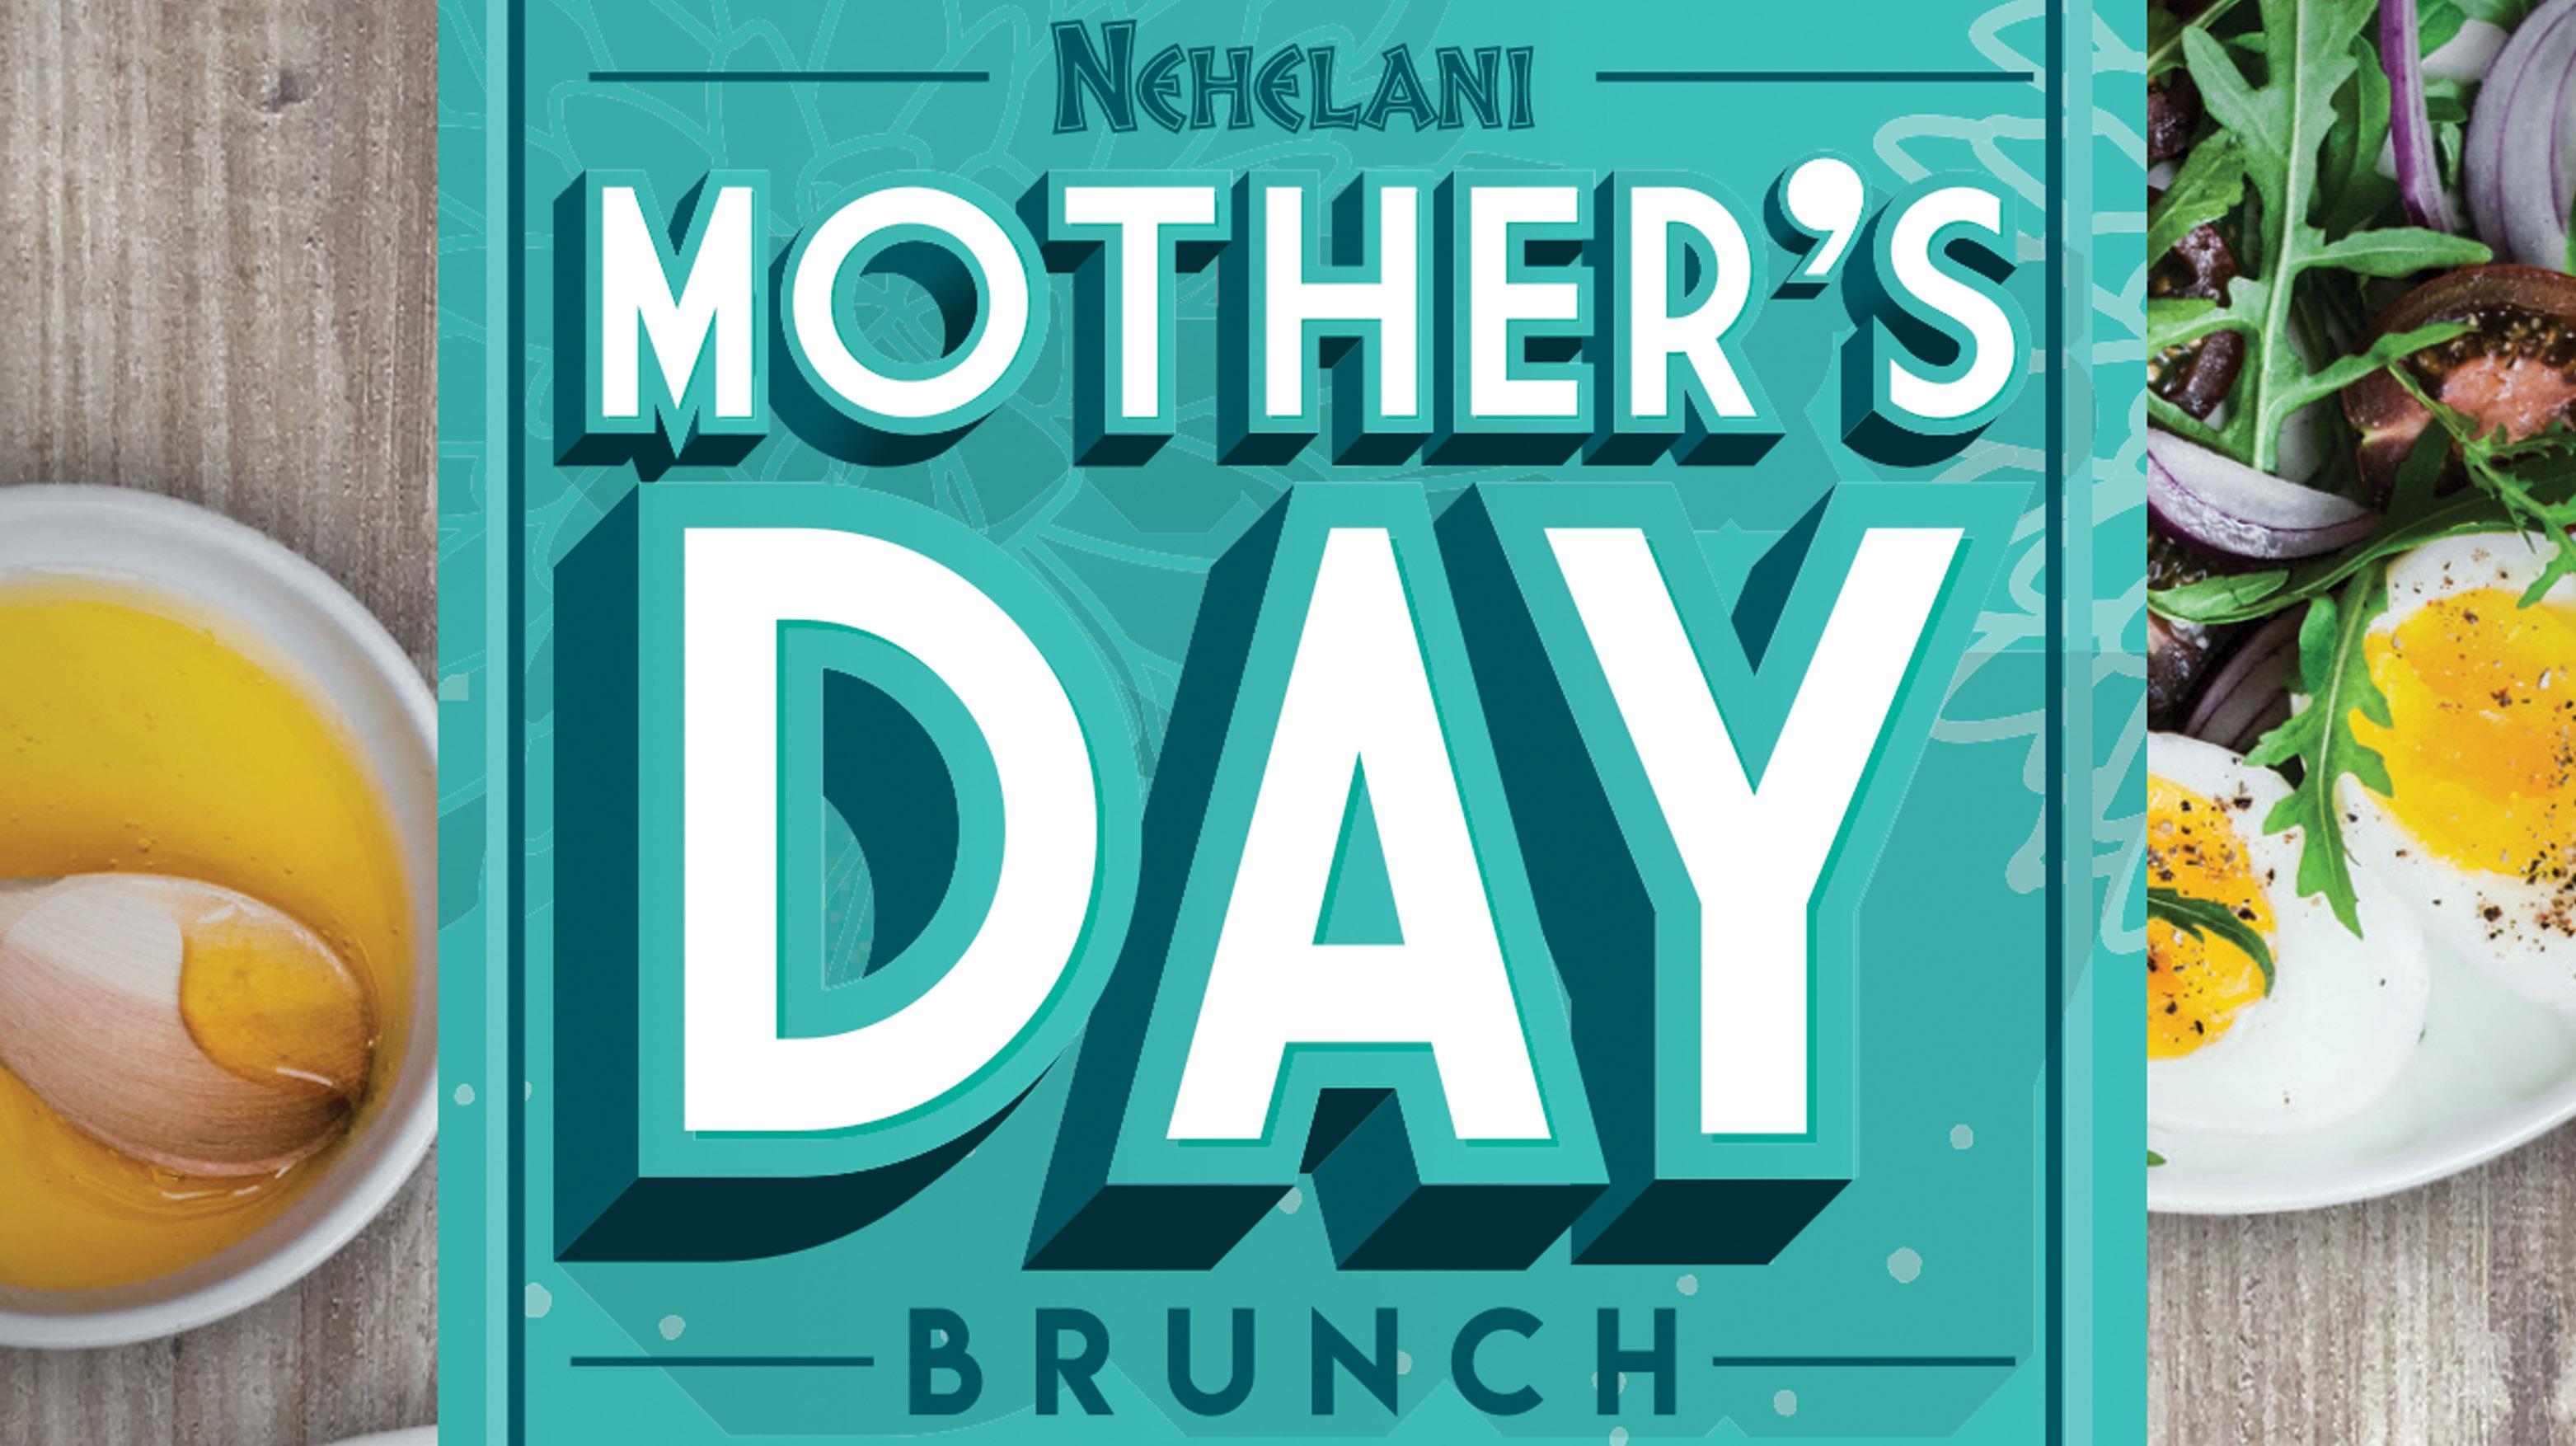 Mother's Day Brunch - Nehelani